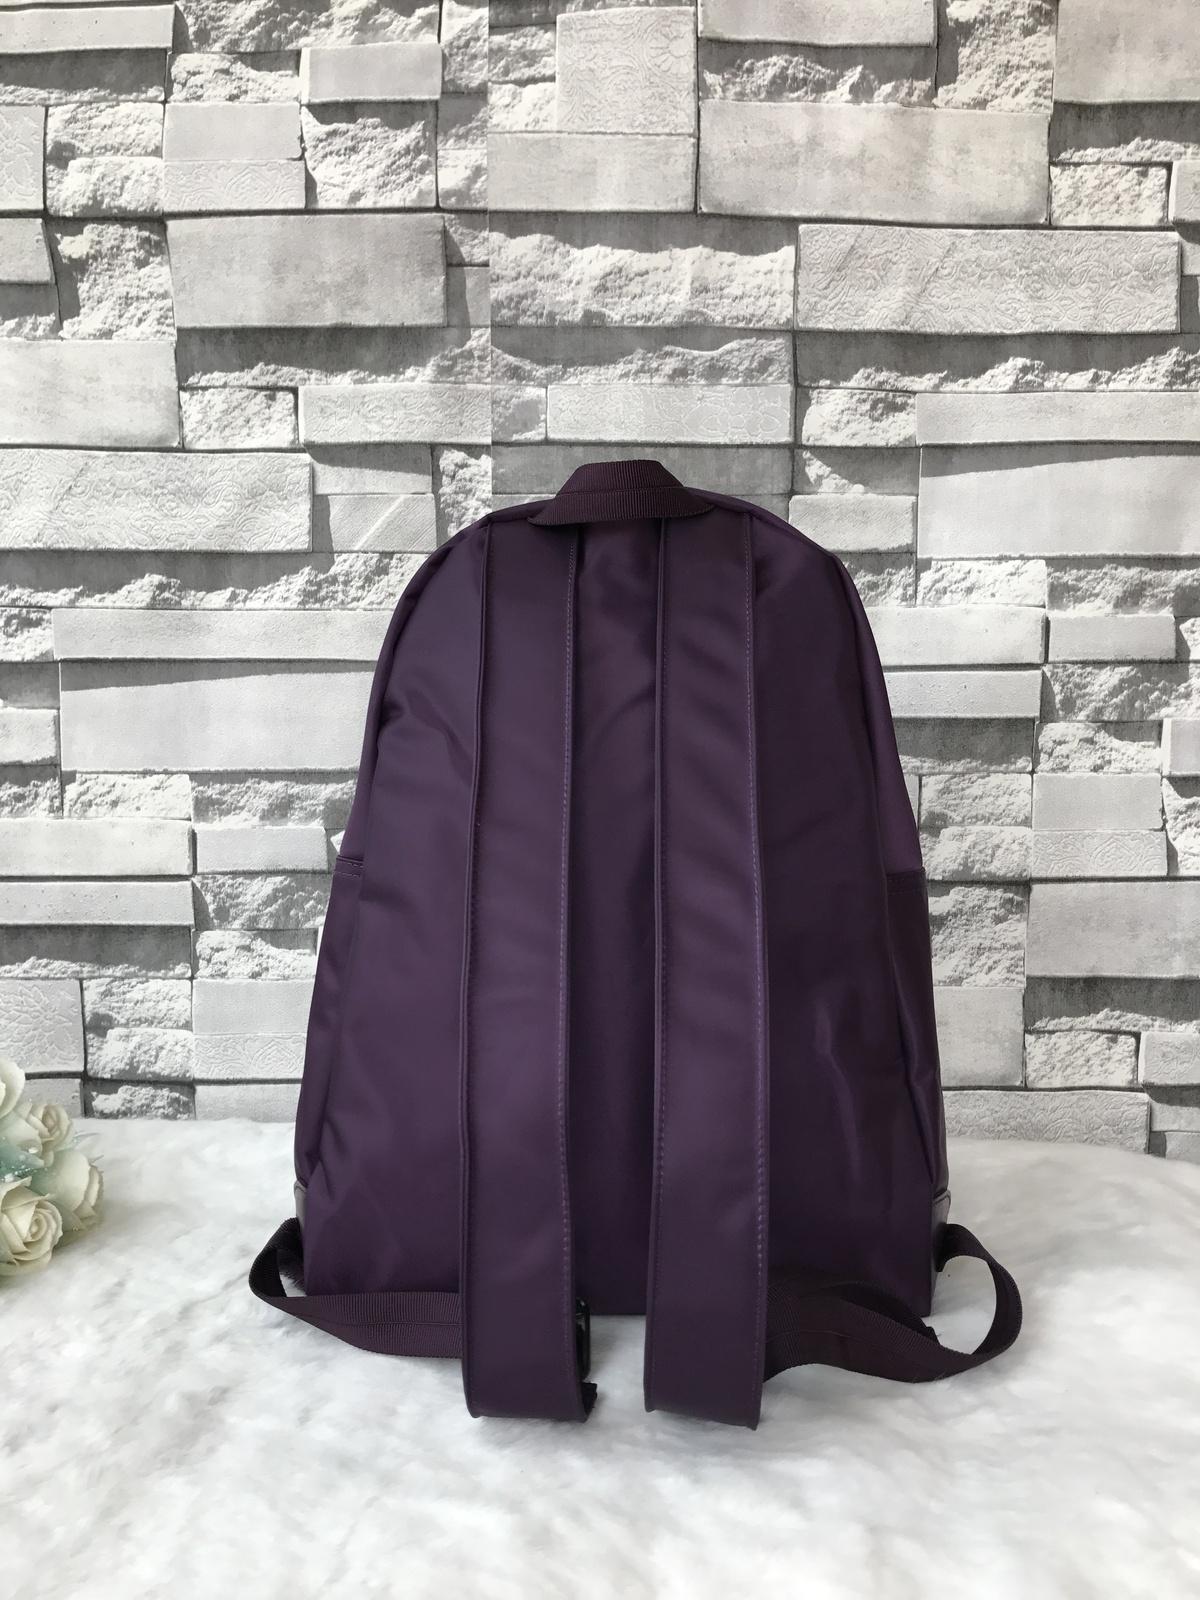 France Made Longchamp Le Pliage Neo Medium And 17 Similar Items Black Authentic Backpack Bag Navy Blue 1119578645